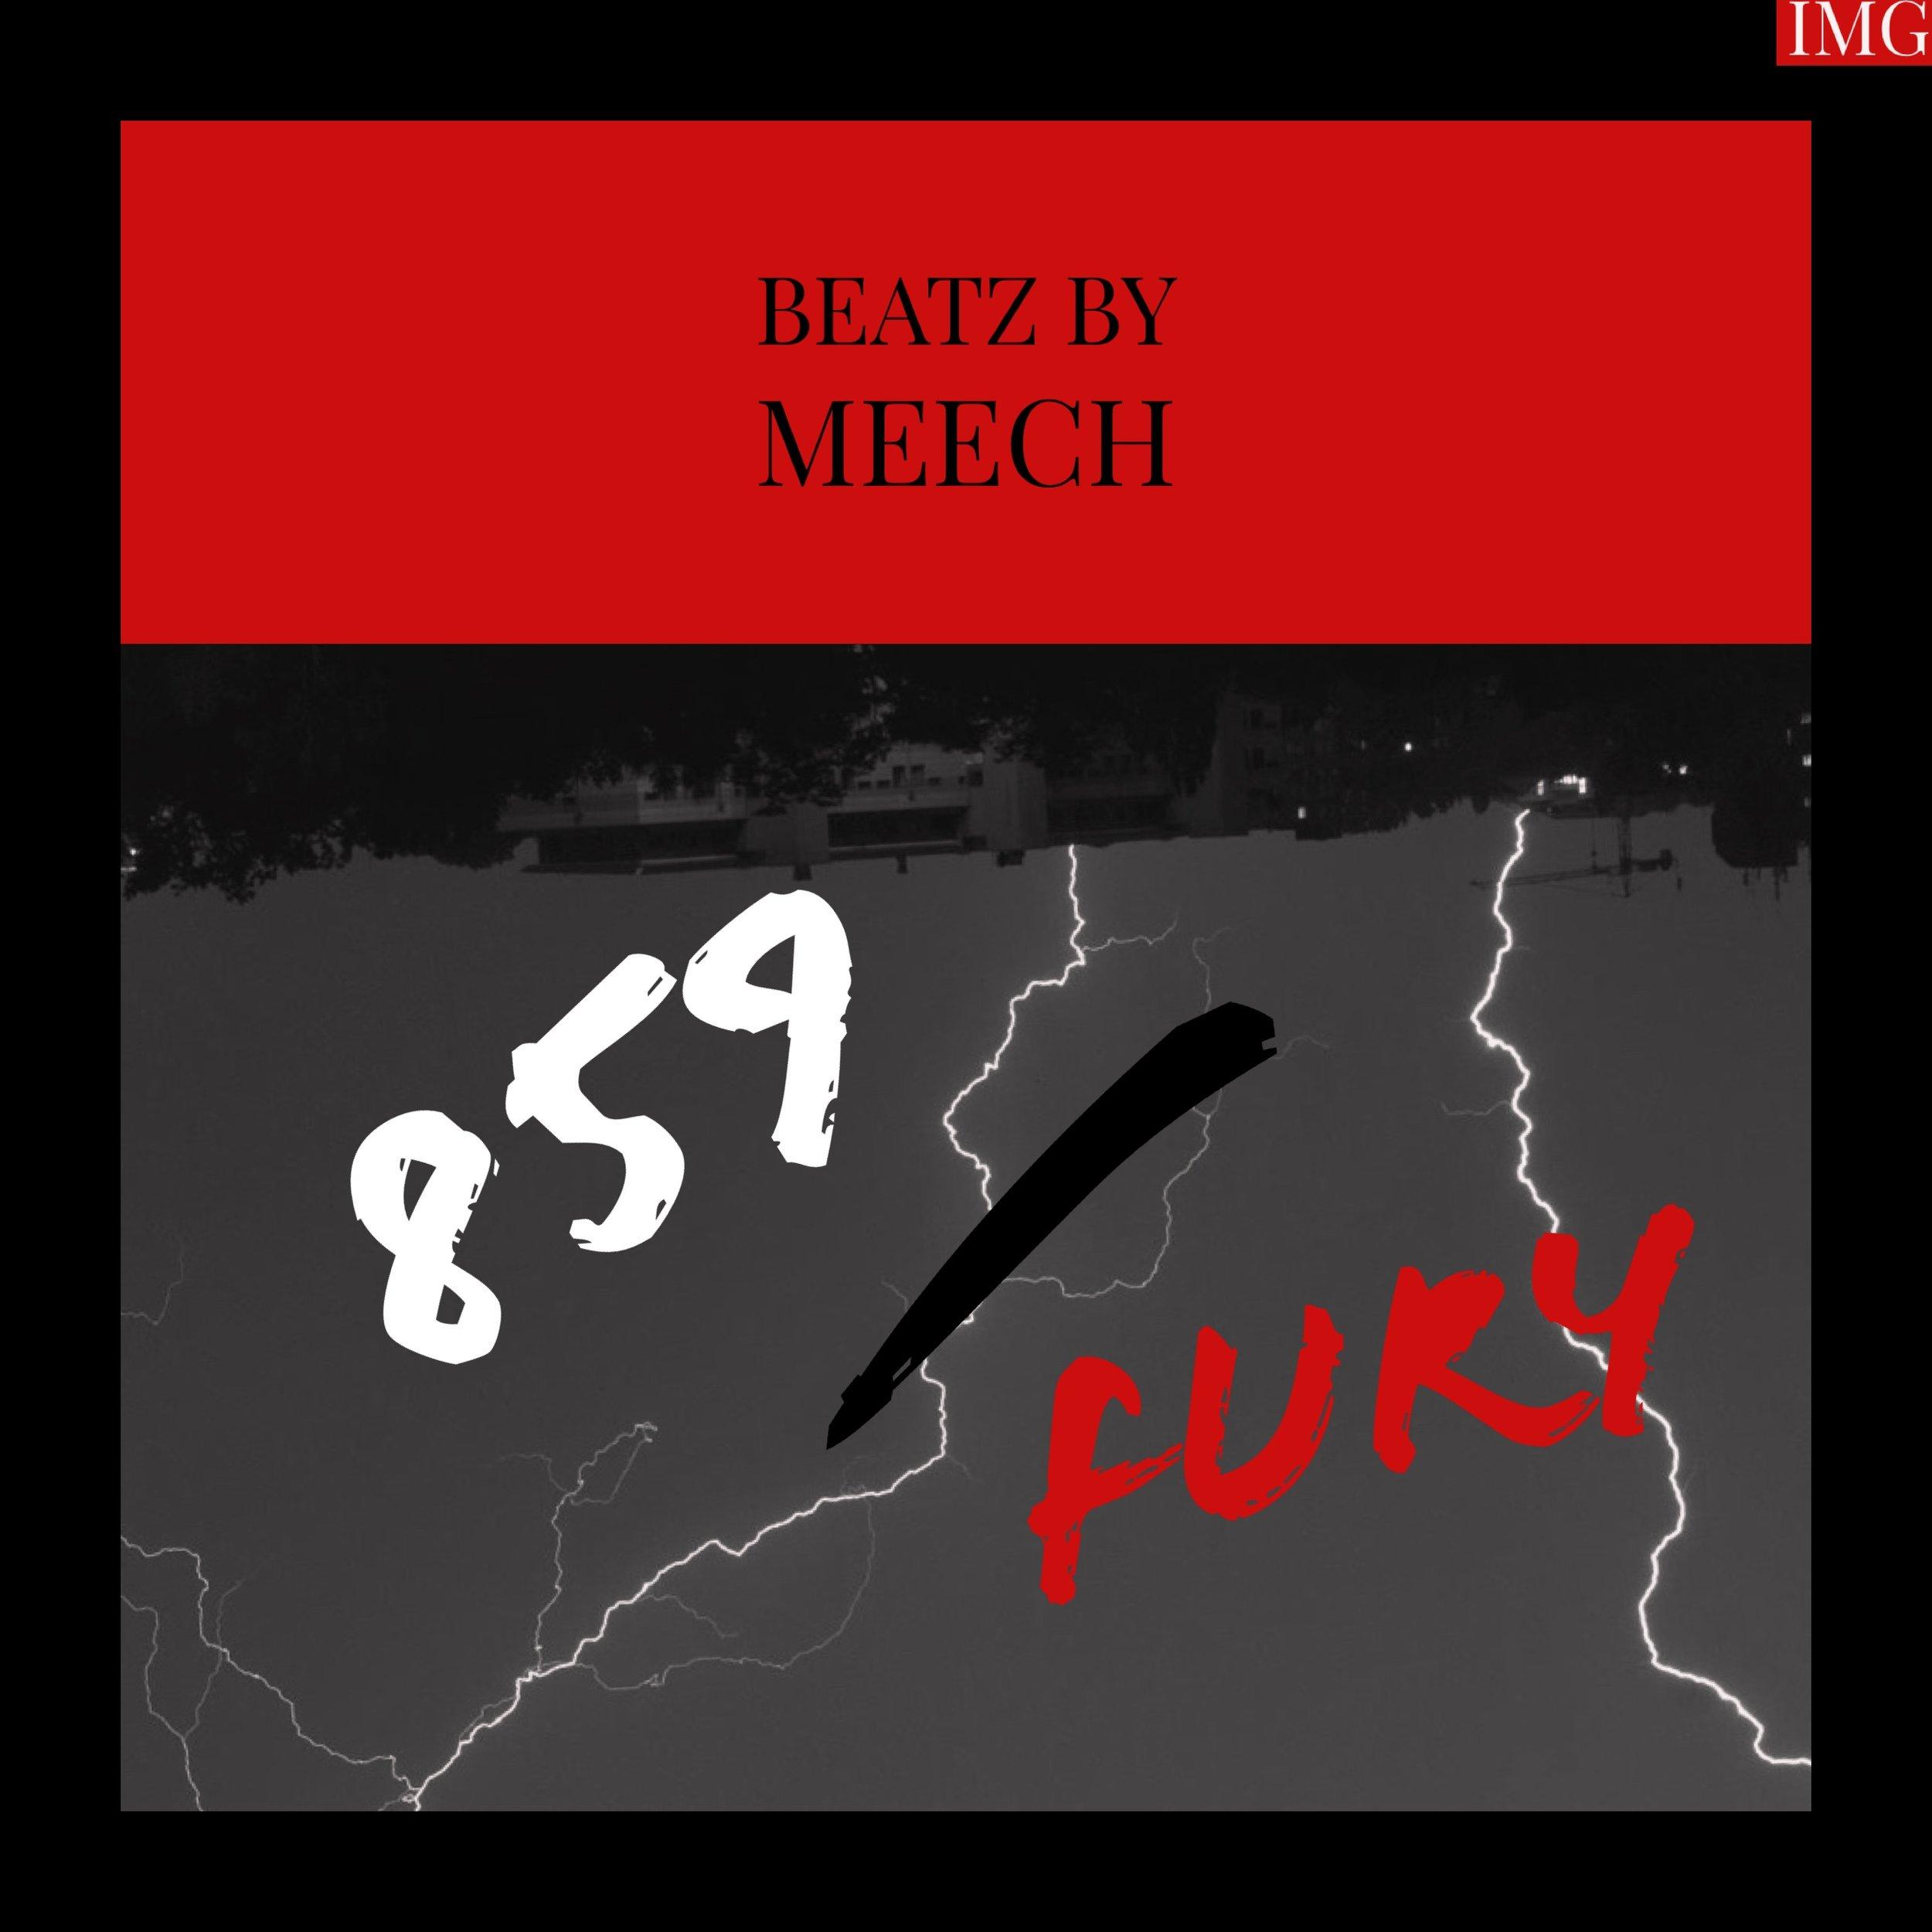 859 FURY (COVER ART).jpeg